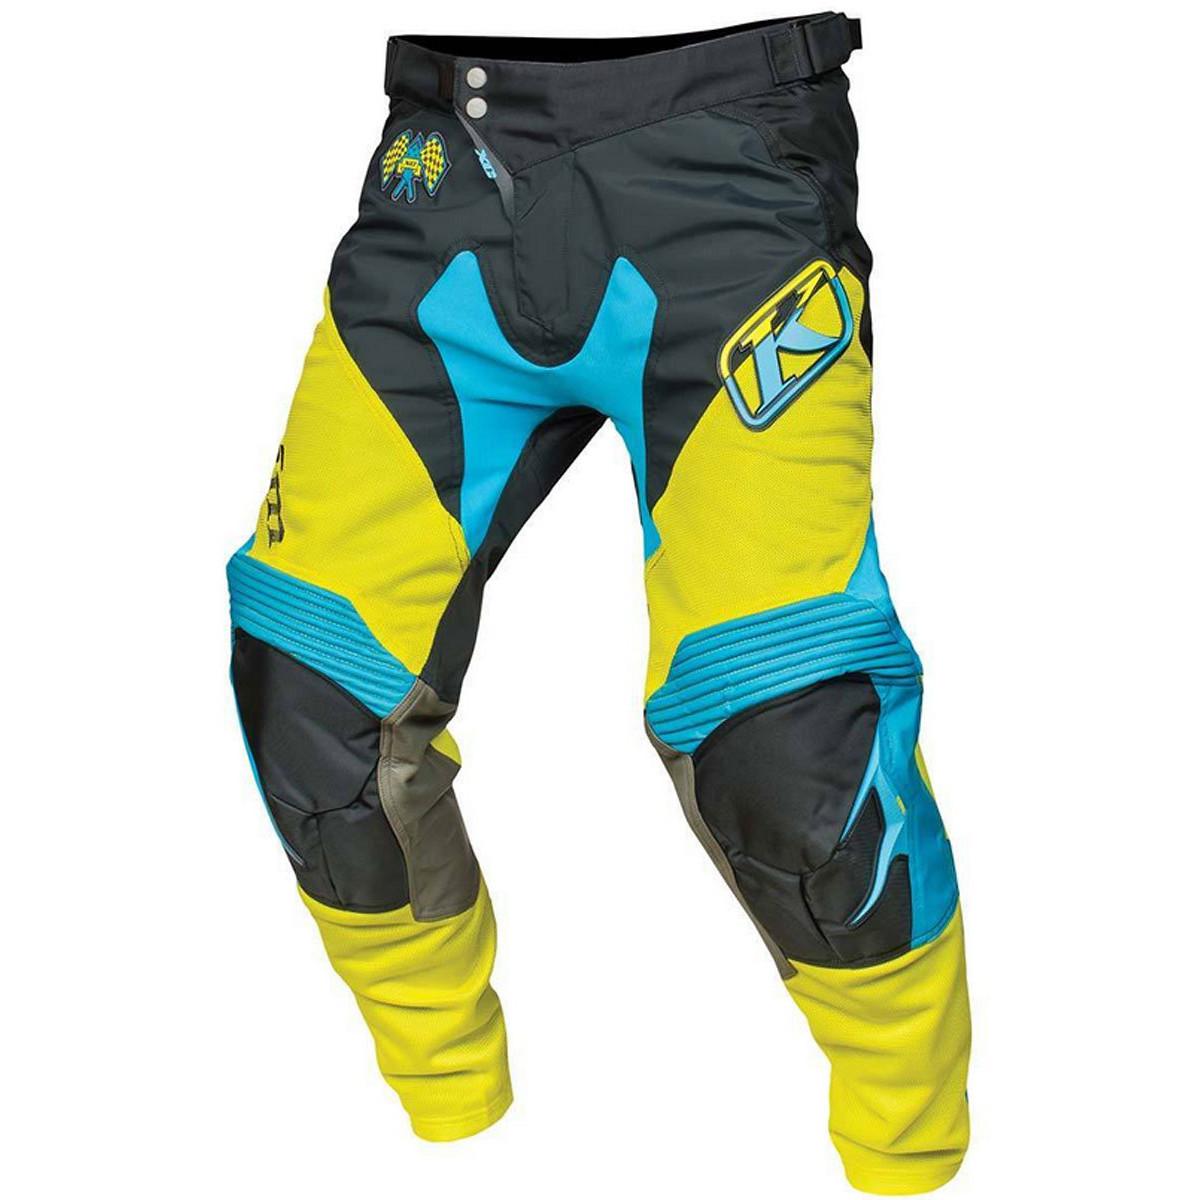 Klim Xc Pants  2014-klim-xc-pants-mcss.jpg